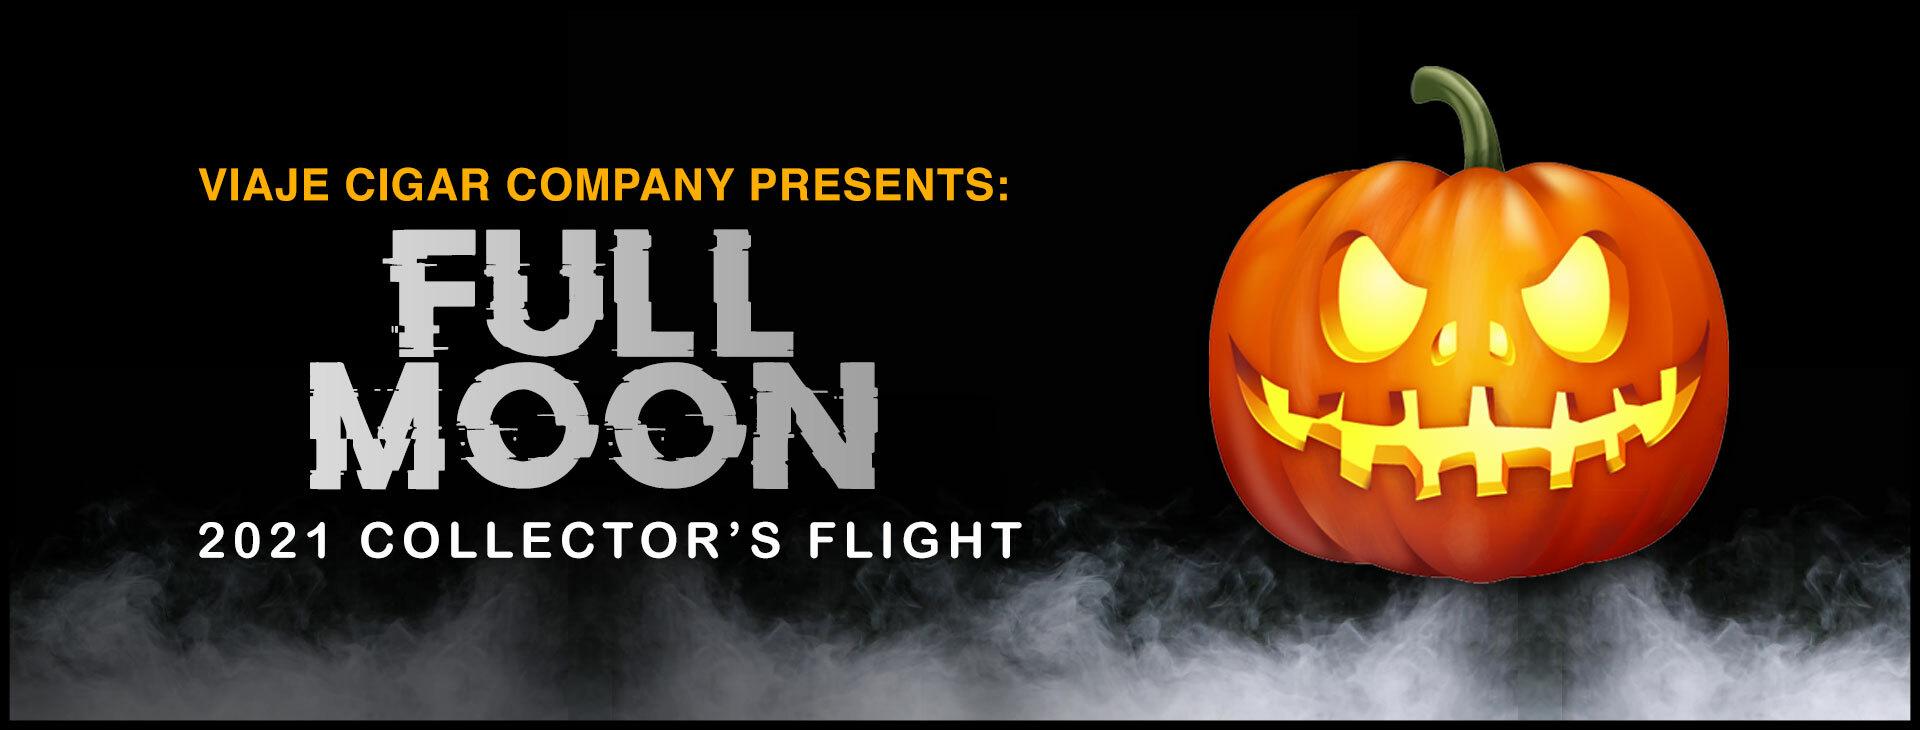 Viaje Full Moon 2021 Collector's Flight